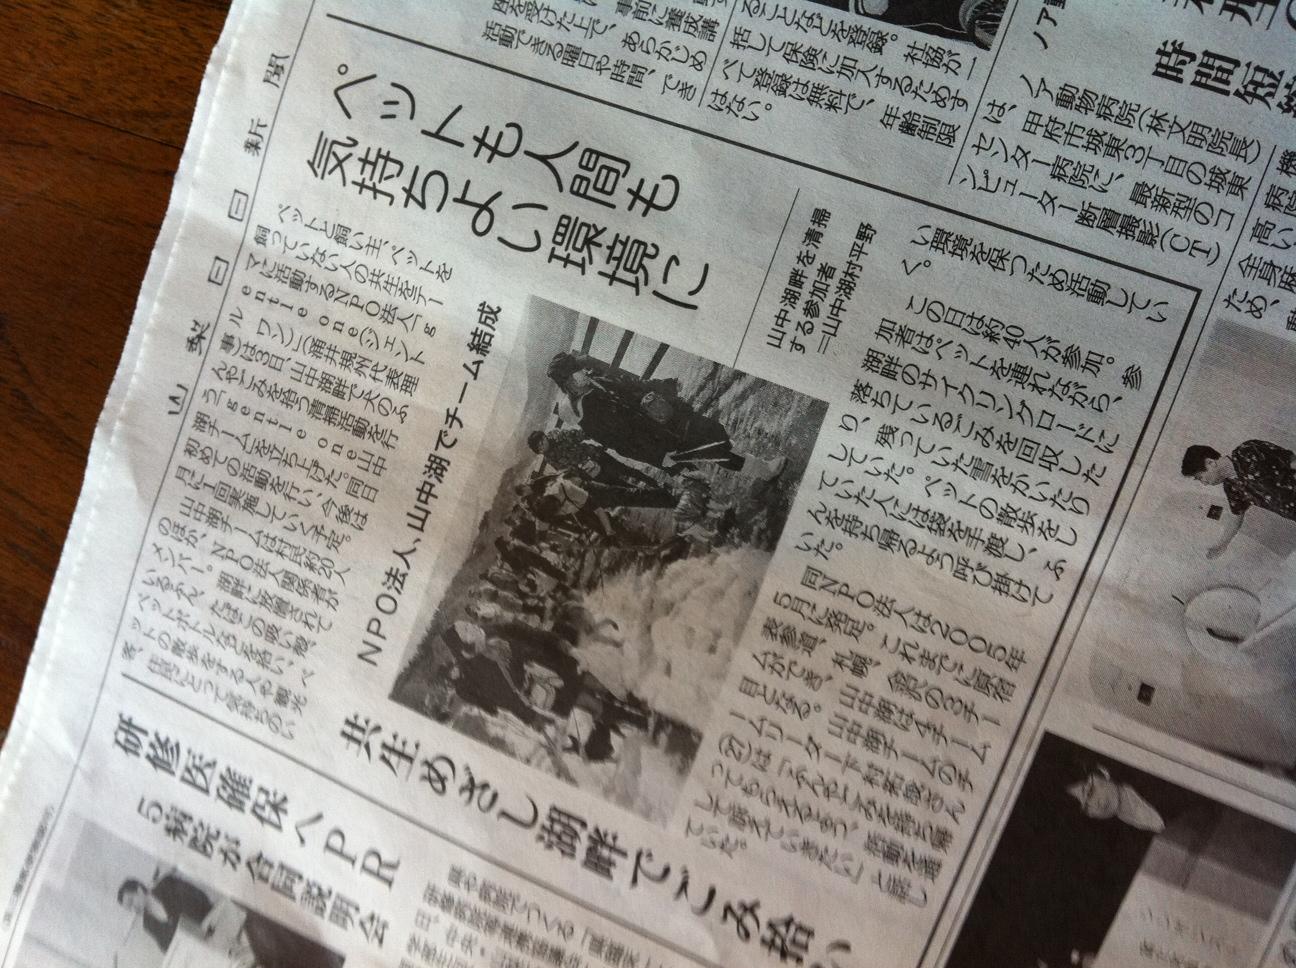 http://gentleone.jp/teams/yamanakako/20120304-%E5%B1%B1%E6%A2%A8%E6%97%A5%E6%97%A5.JPG